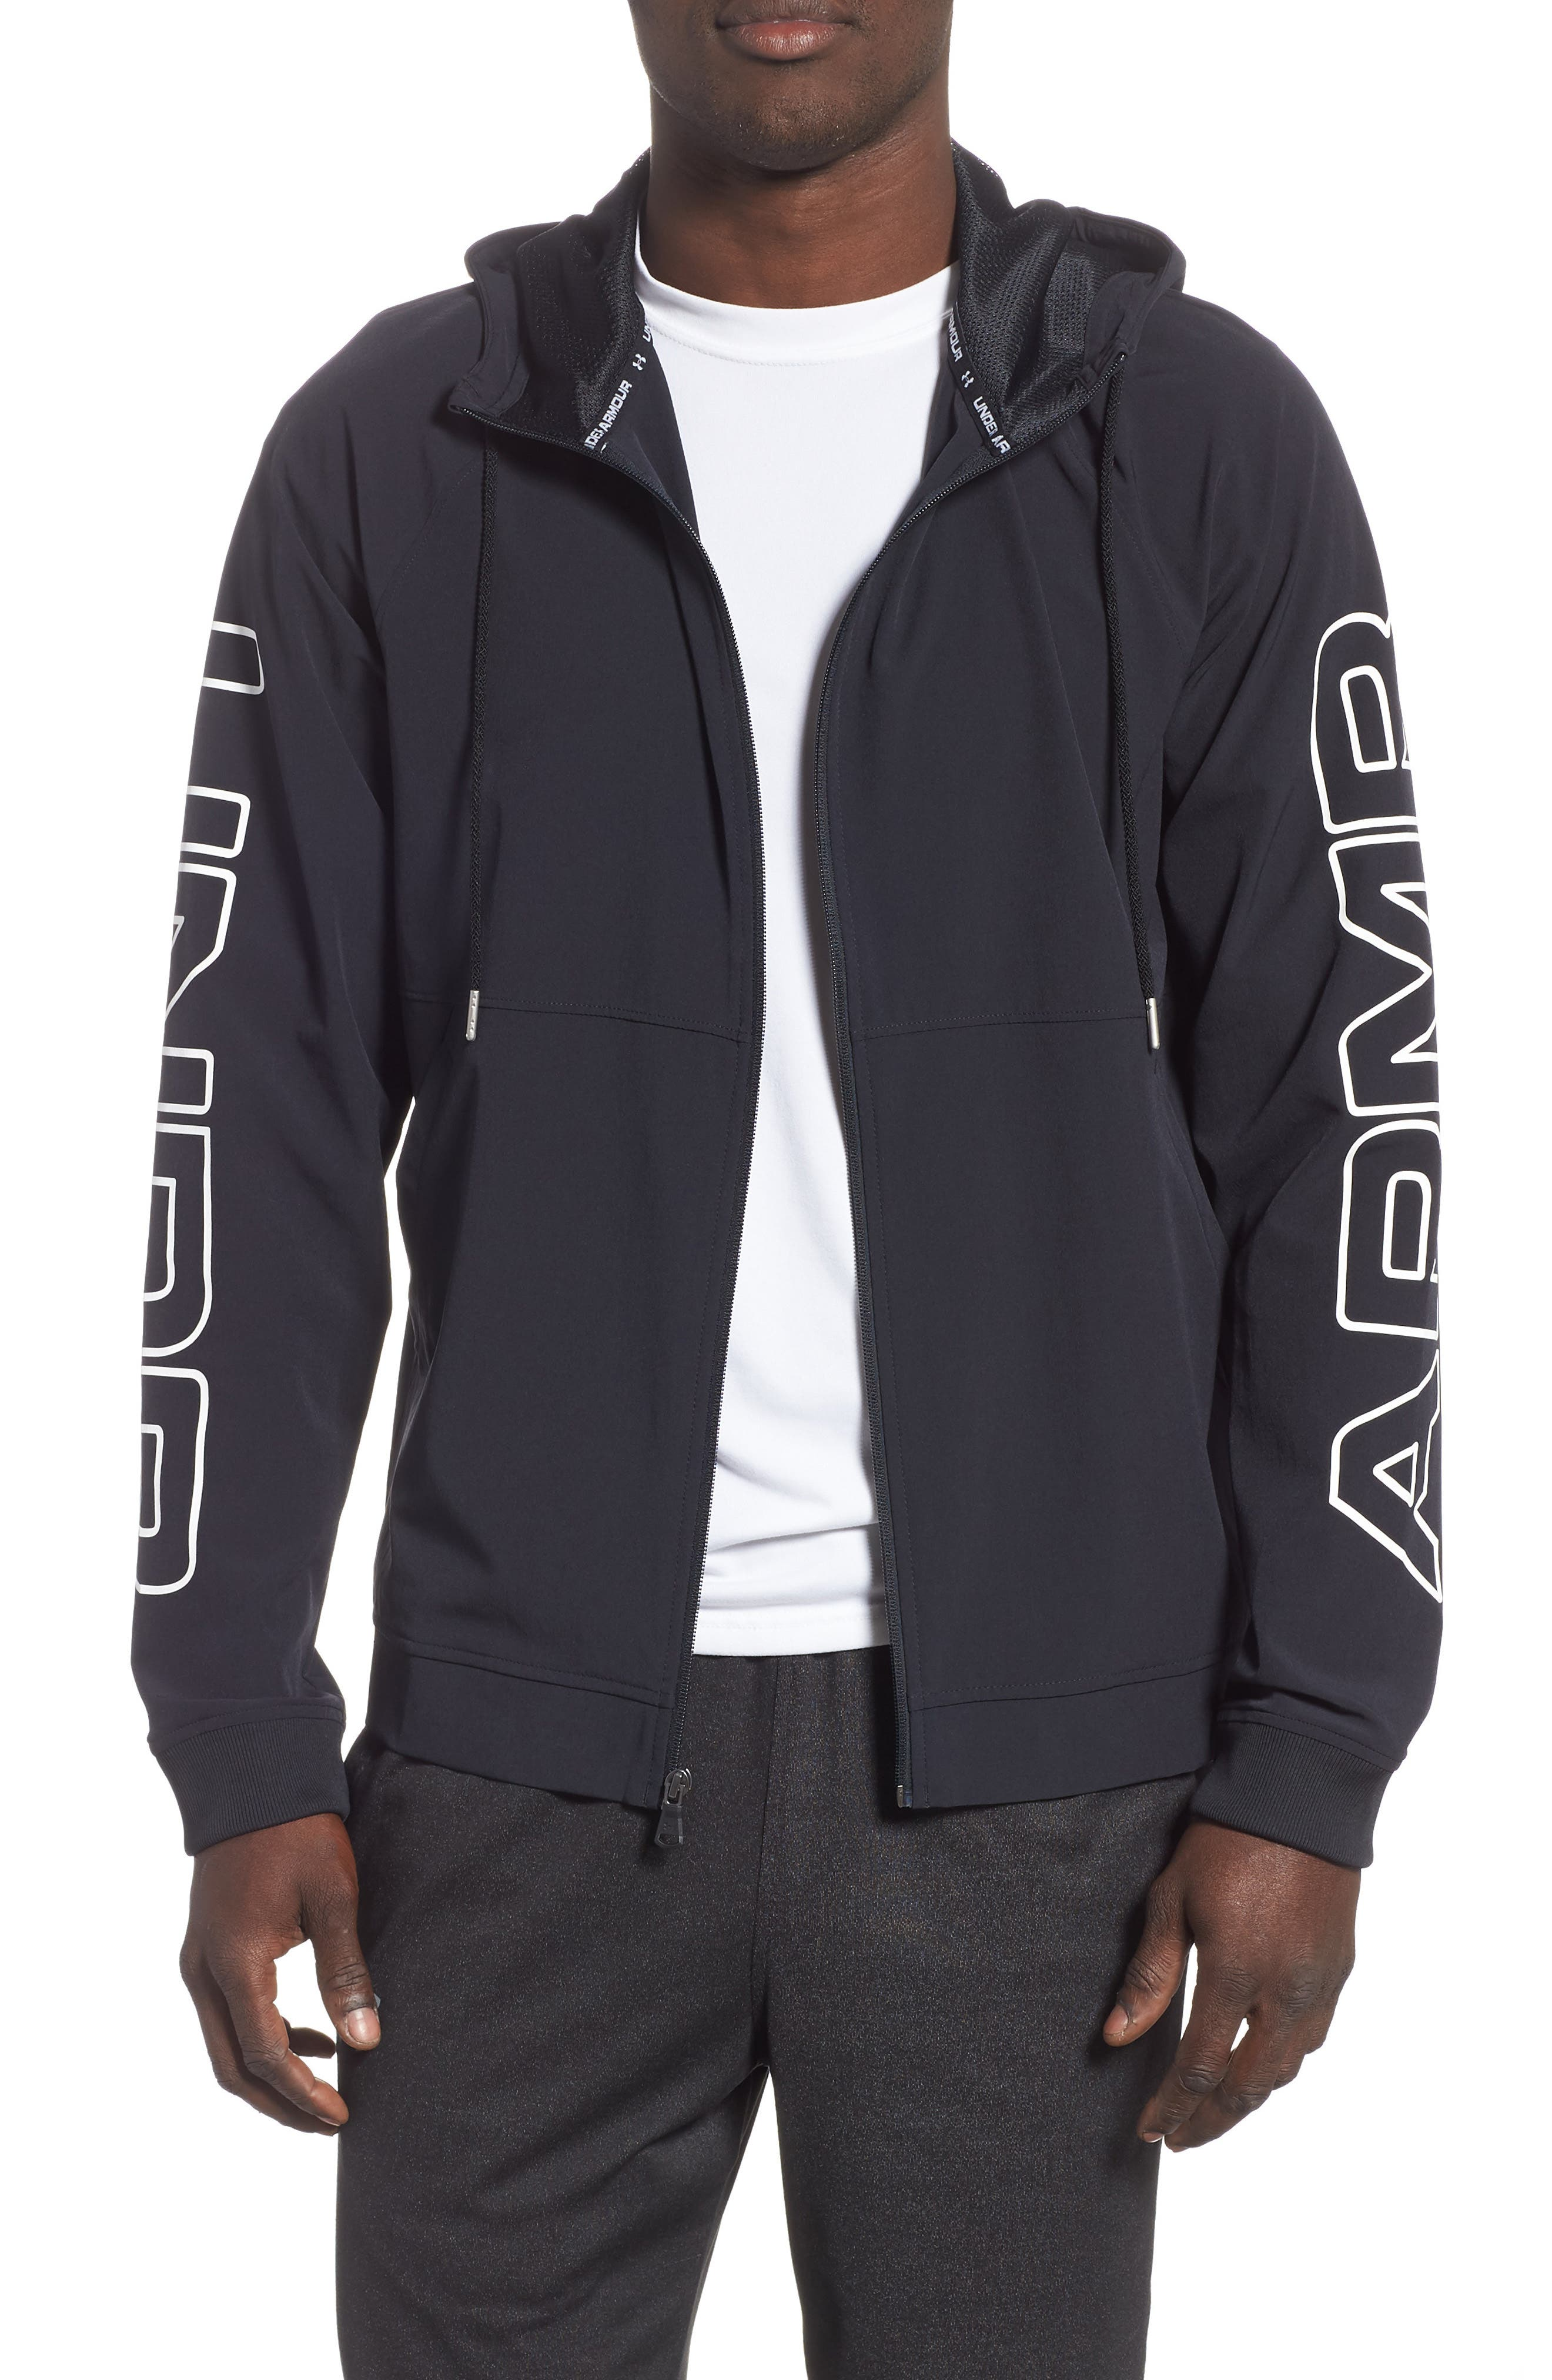 Under Armour Baseline Hooded Jacket, Black